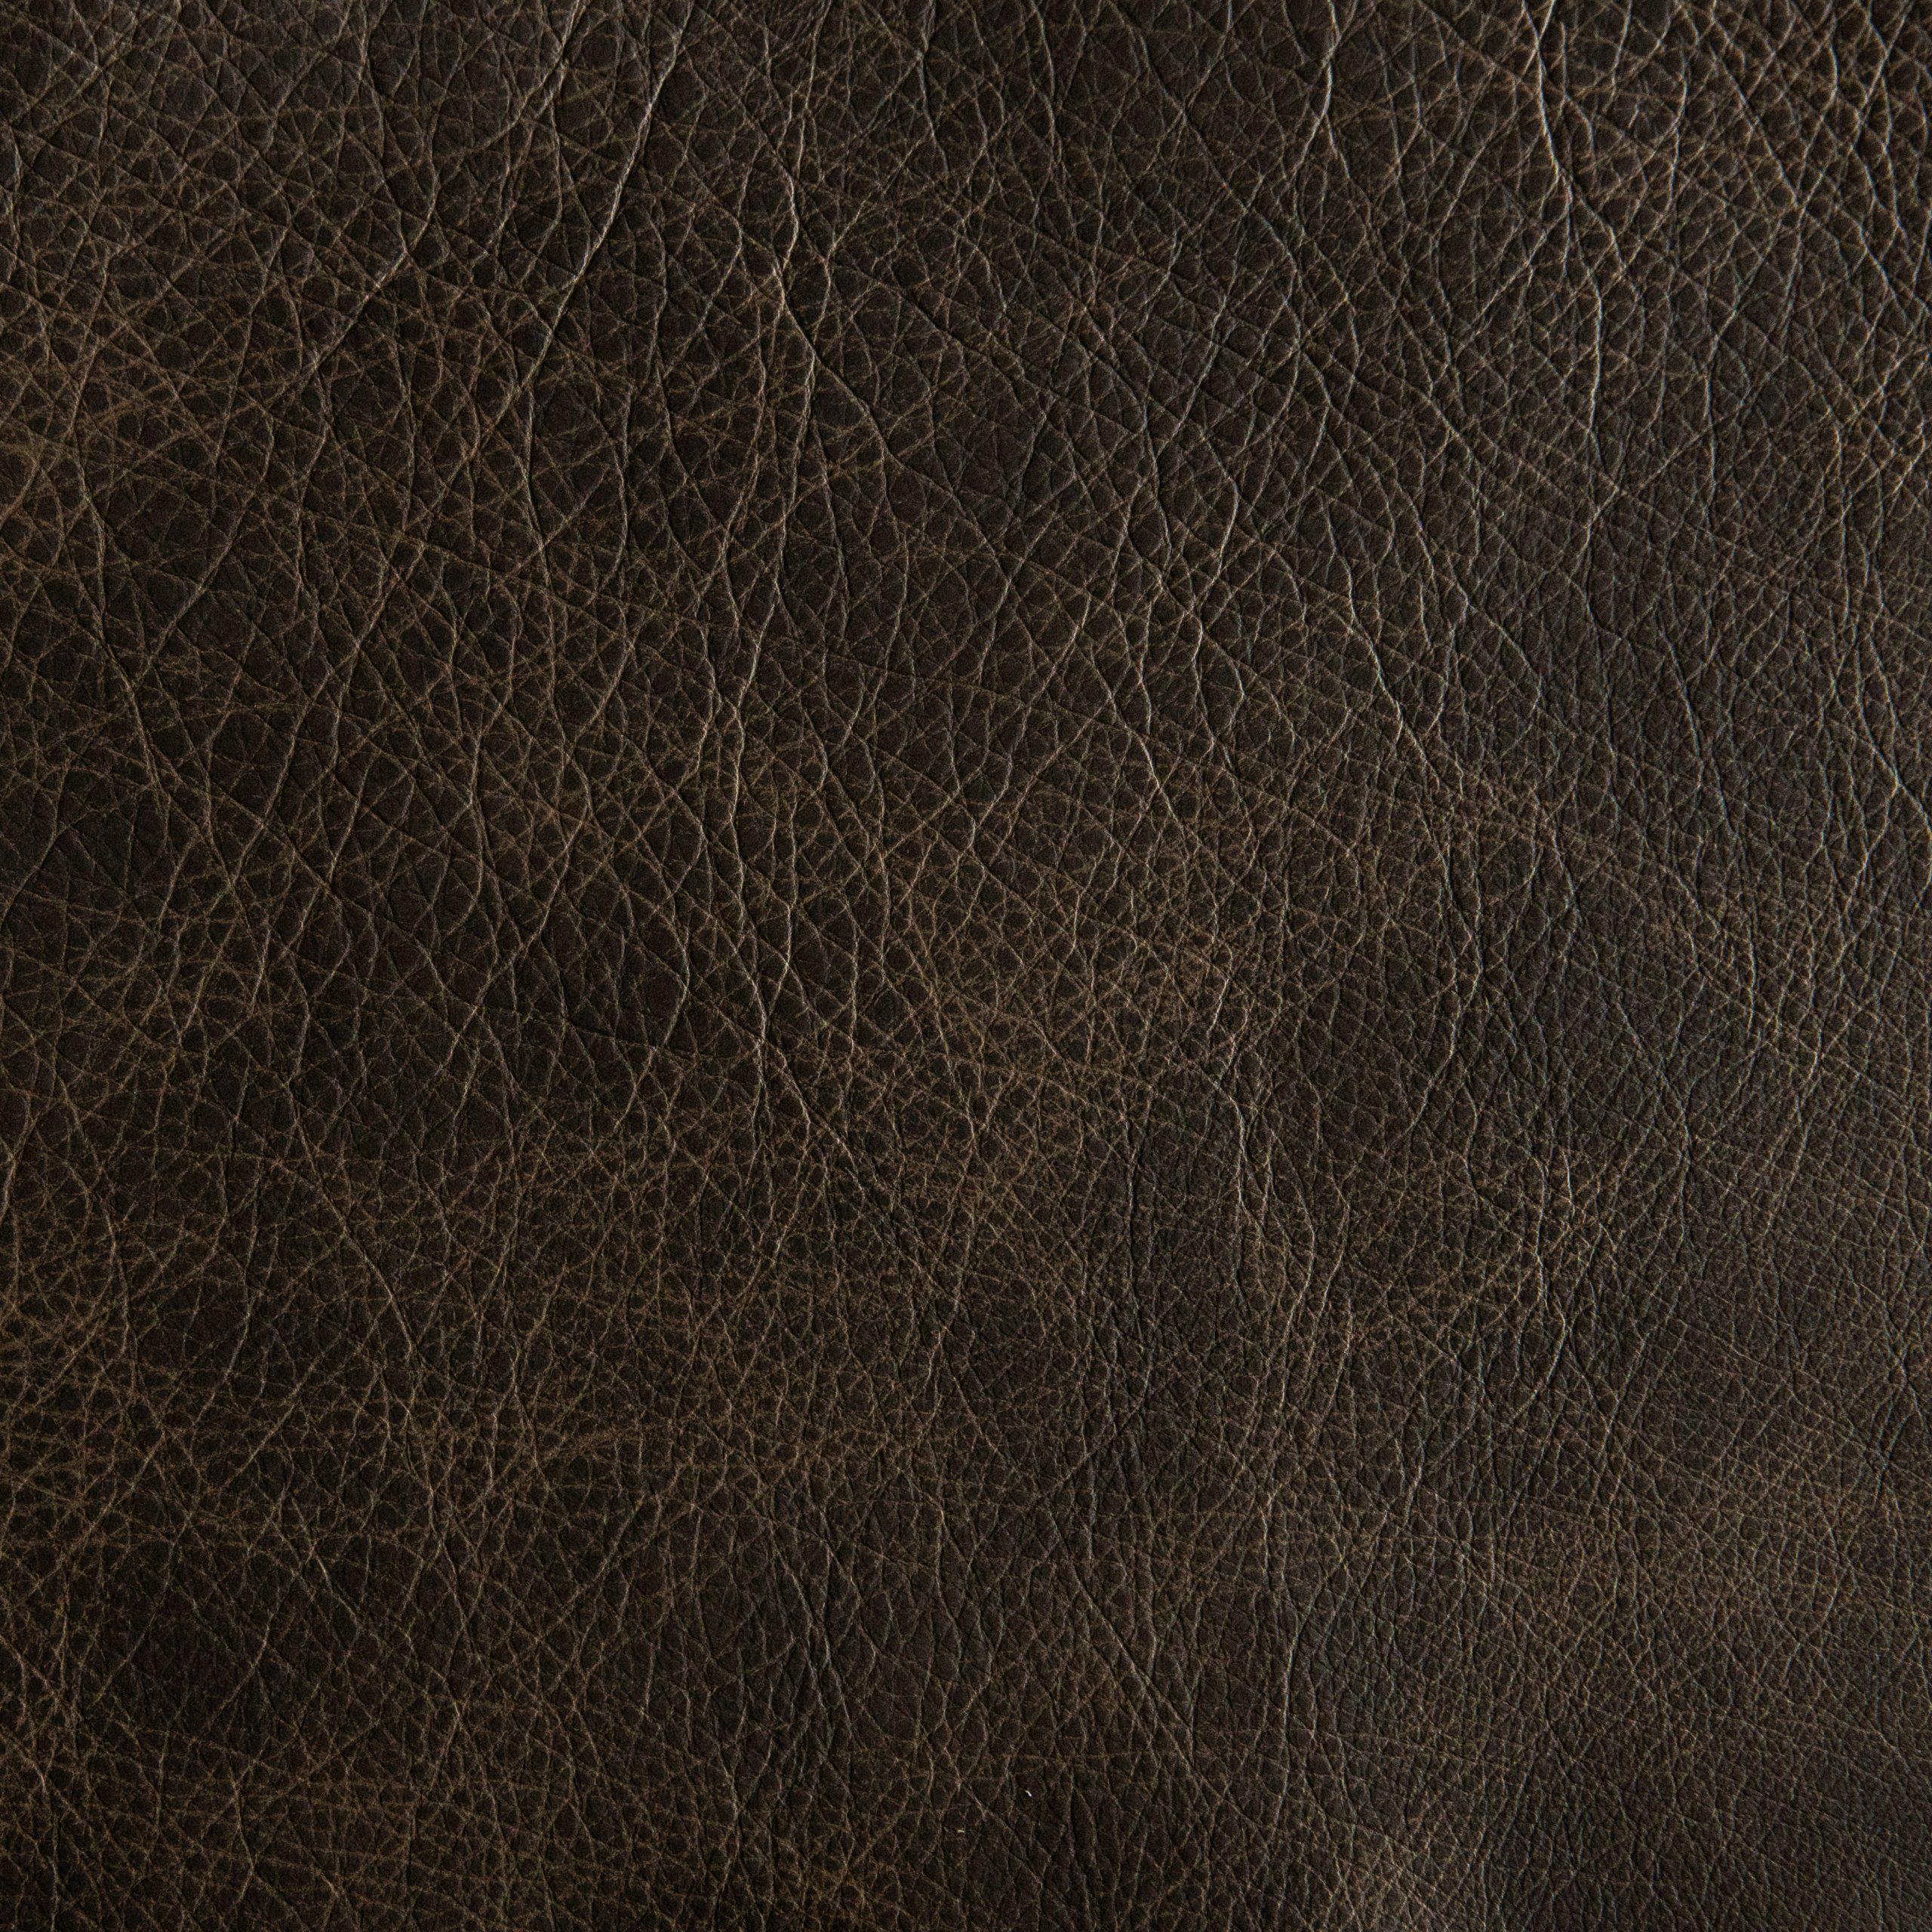 Mushroom Tan Leather Cowhide Partial #BR967